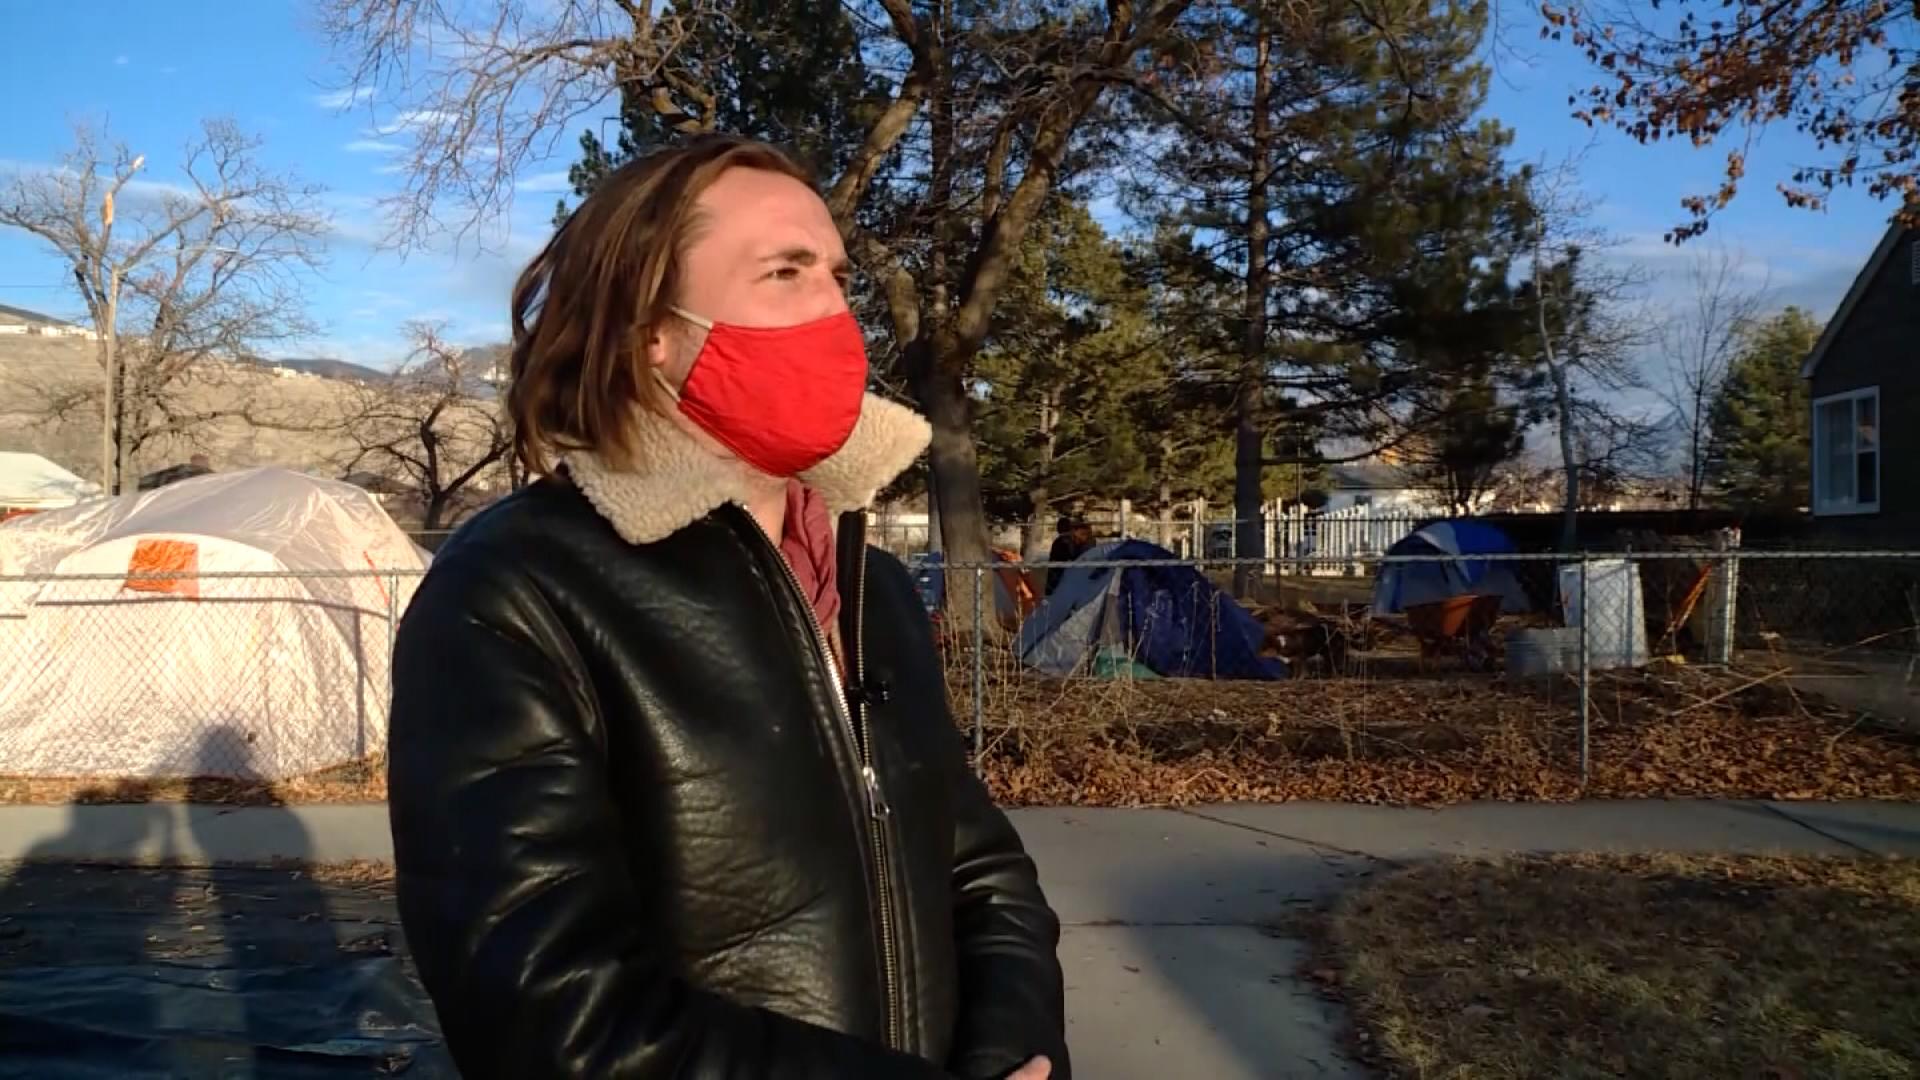 Darin Mann, morador de Salt Lake City, abriu quintal para abrir moradores de rua